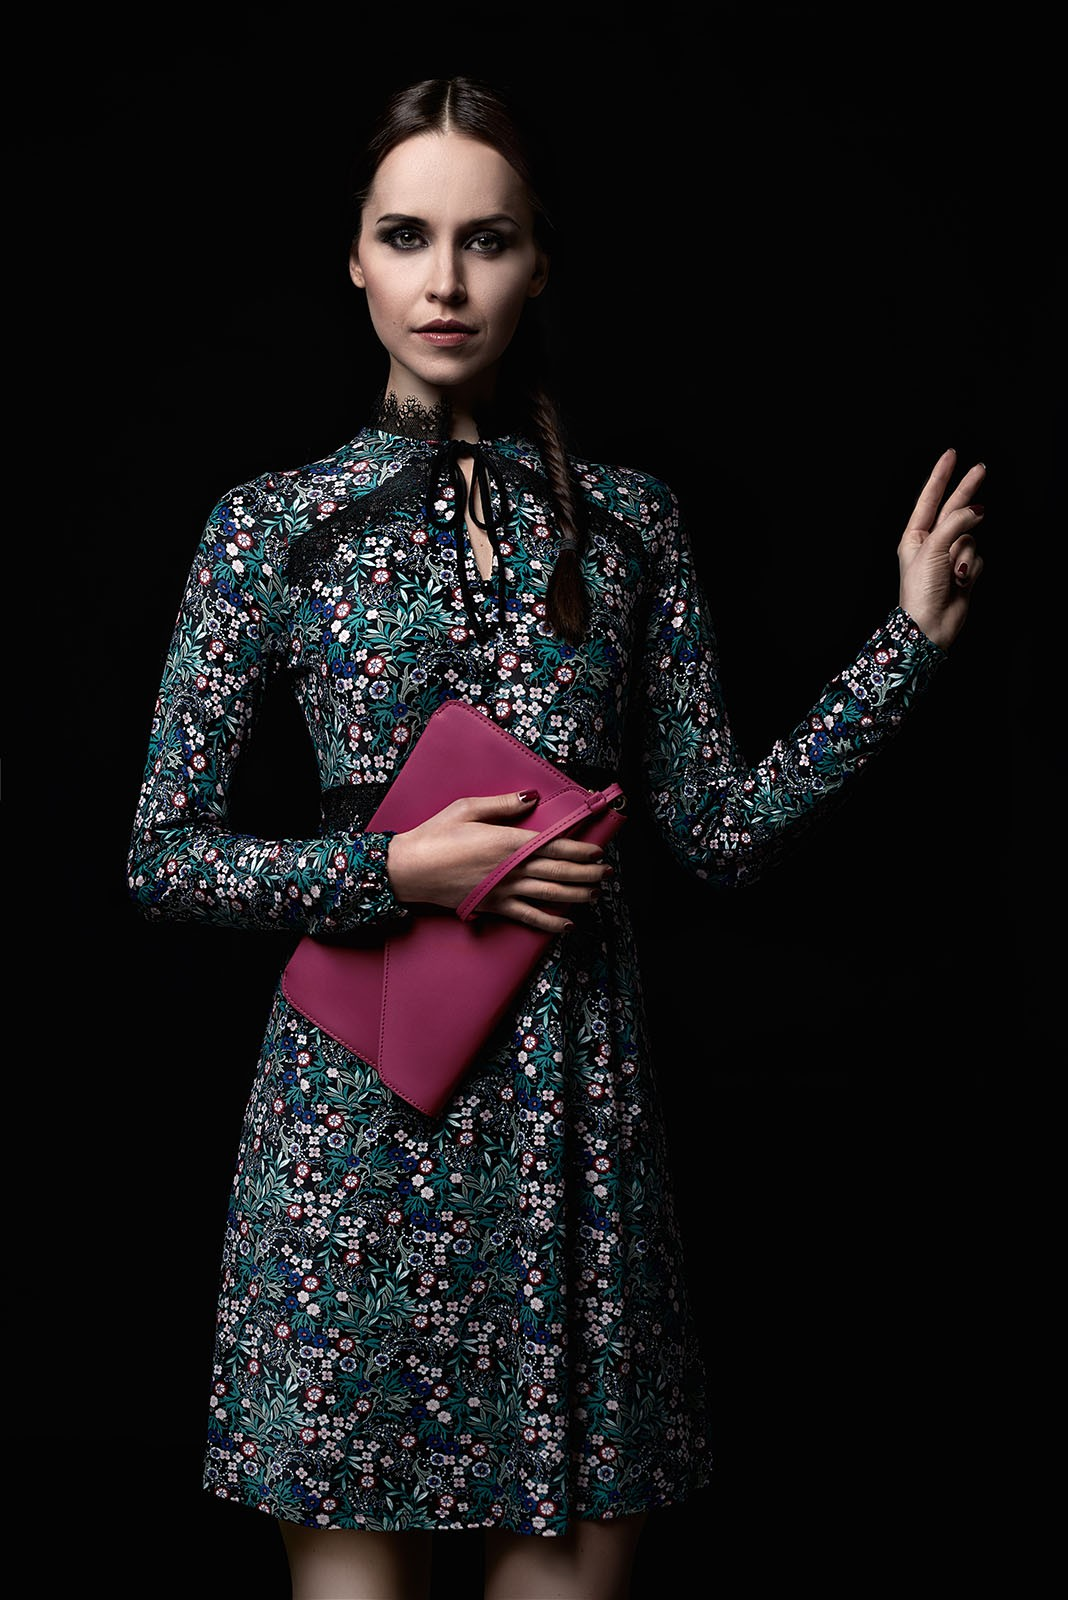 h024a-People-Fashion-Werbefotograf-Fotostudio-PG_Studios